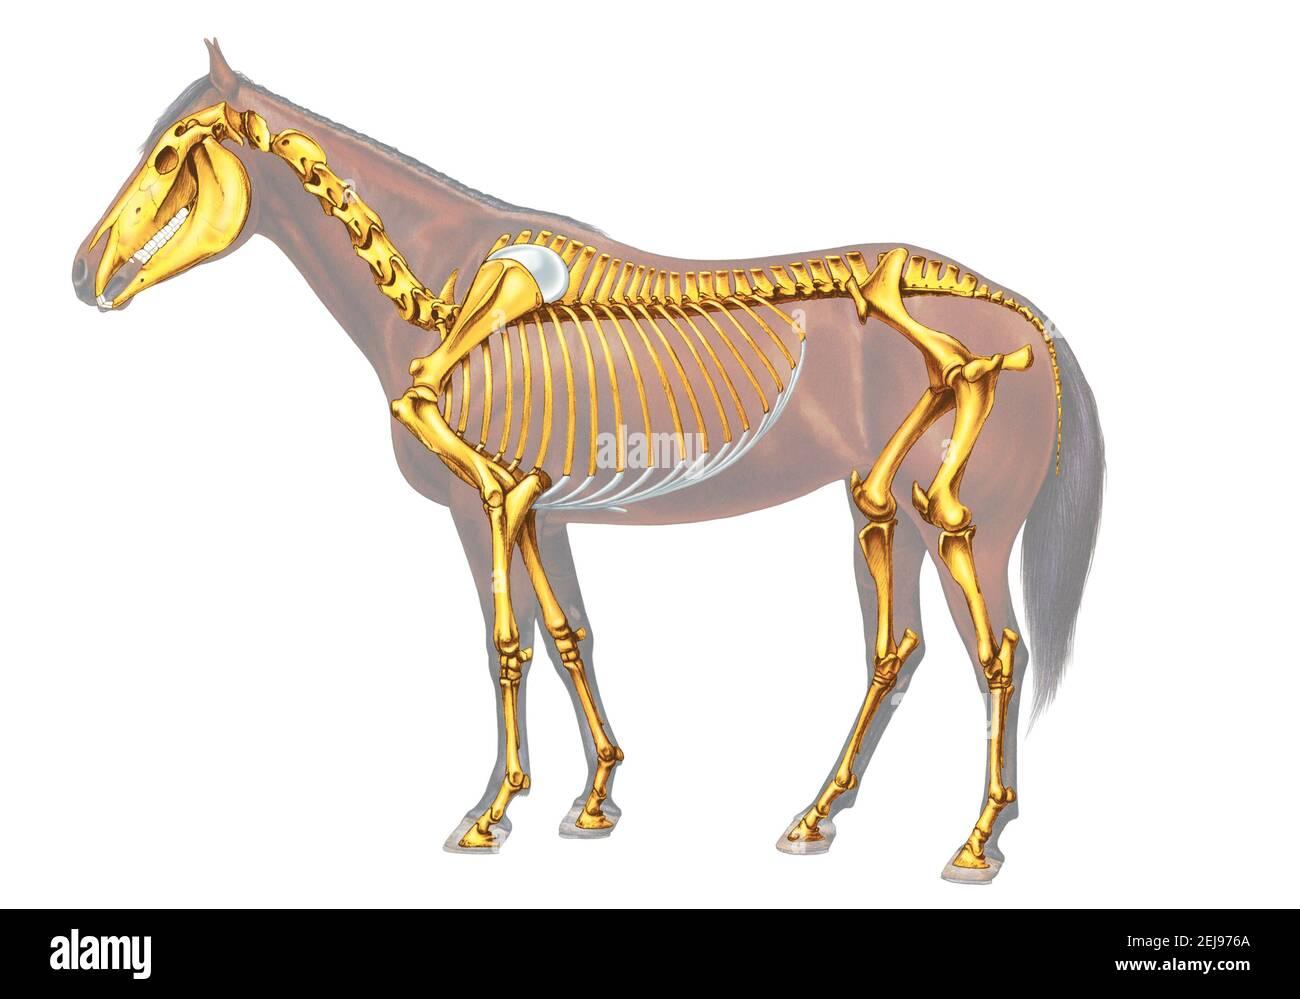 Esqueleto de caballo Foto de stock